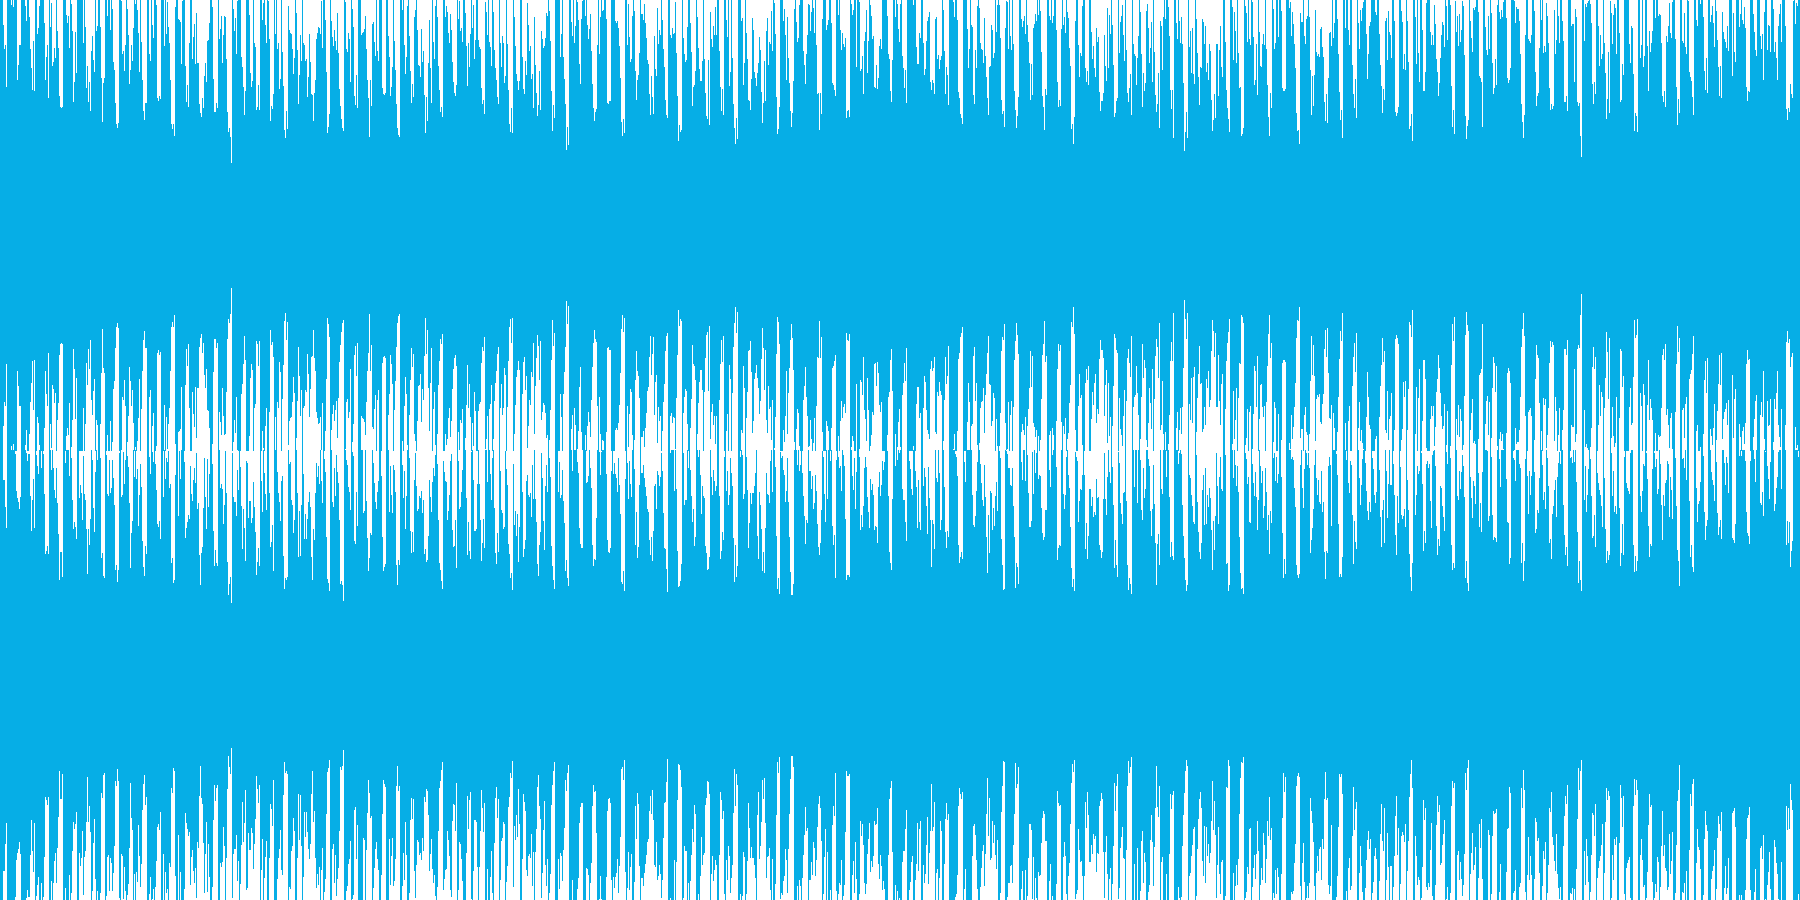 【EDMループ素材】企業・映像制作向きFの再生済みの波形